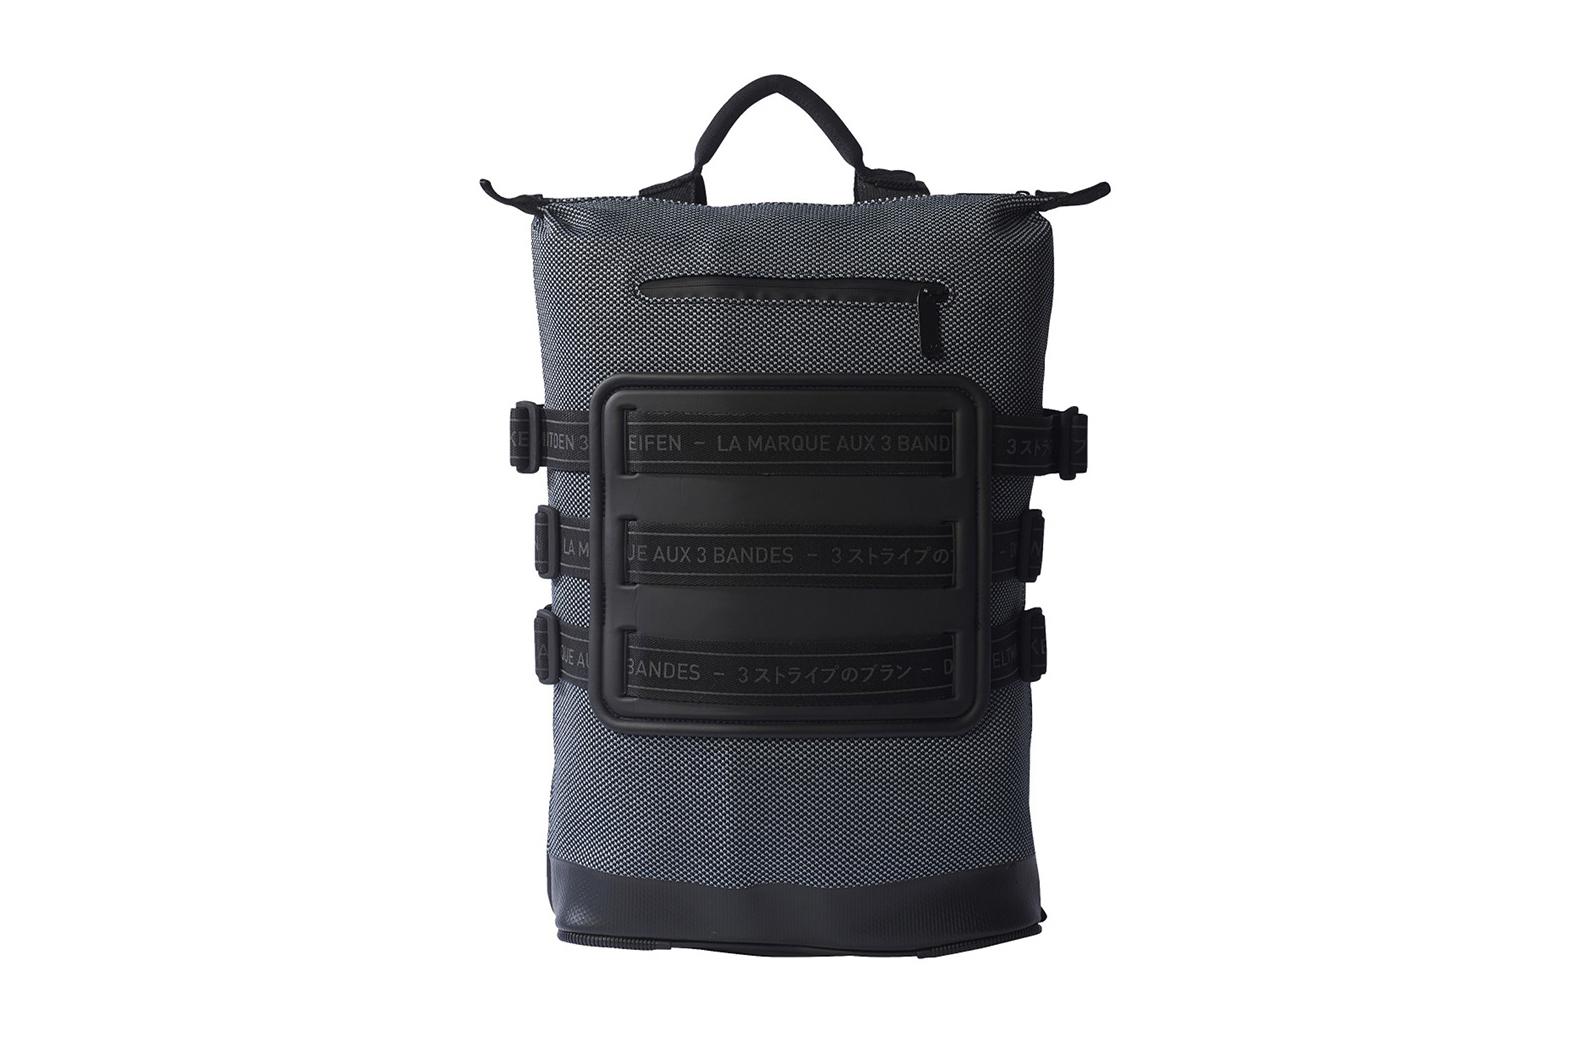 adidas Originals NMD Backpack Primeknit Footwear Three Stripes Germany Accessories Bags - 3746558